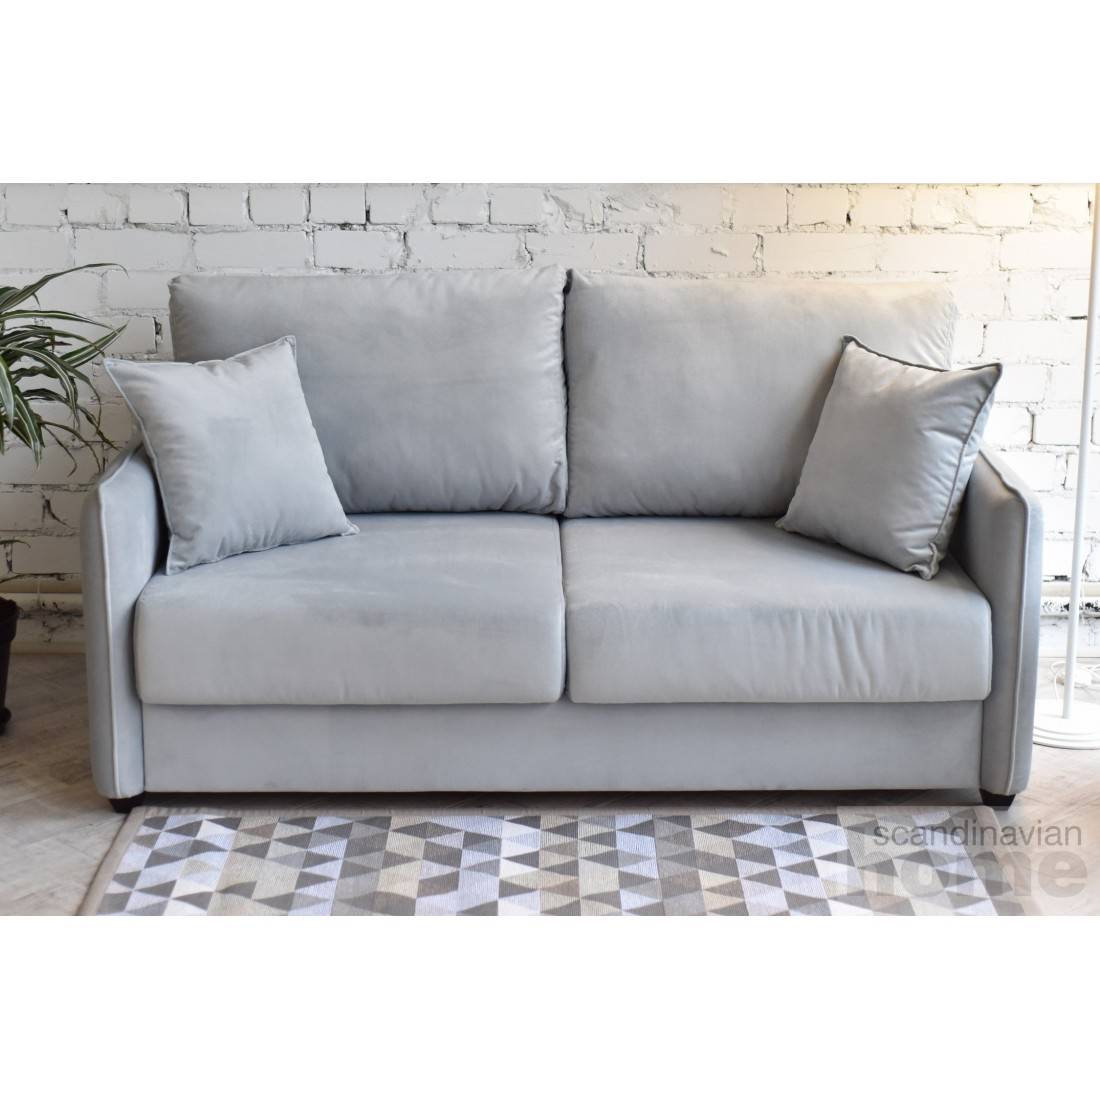 Anne flat folding sofa